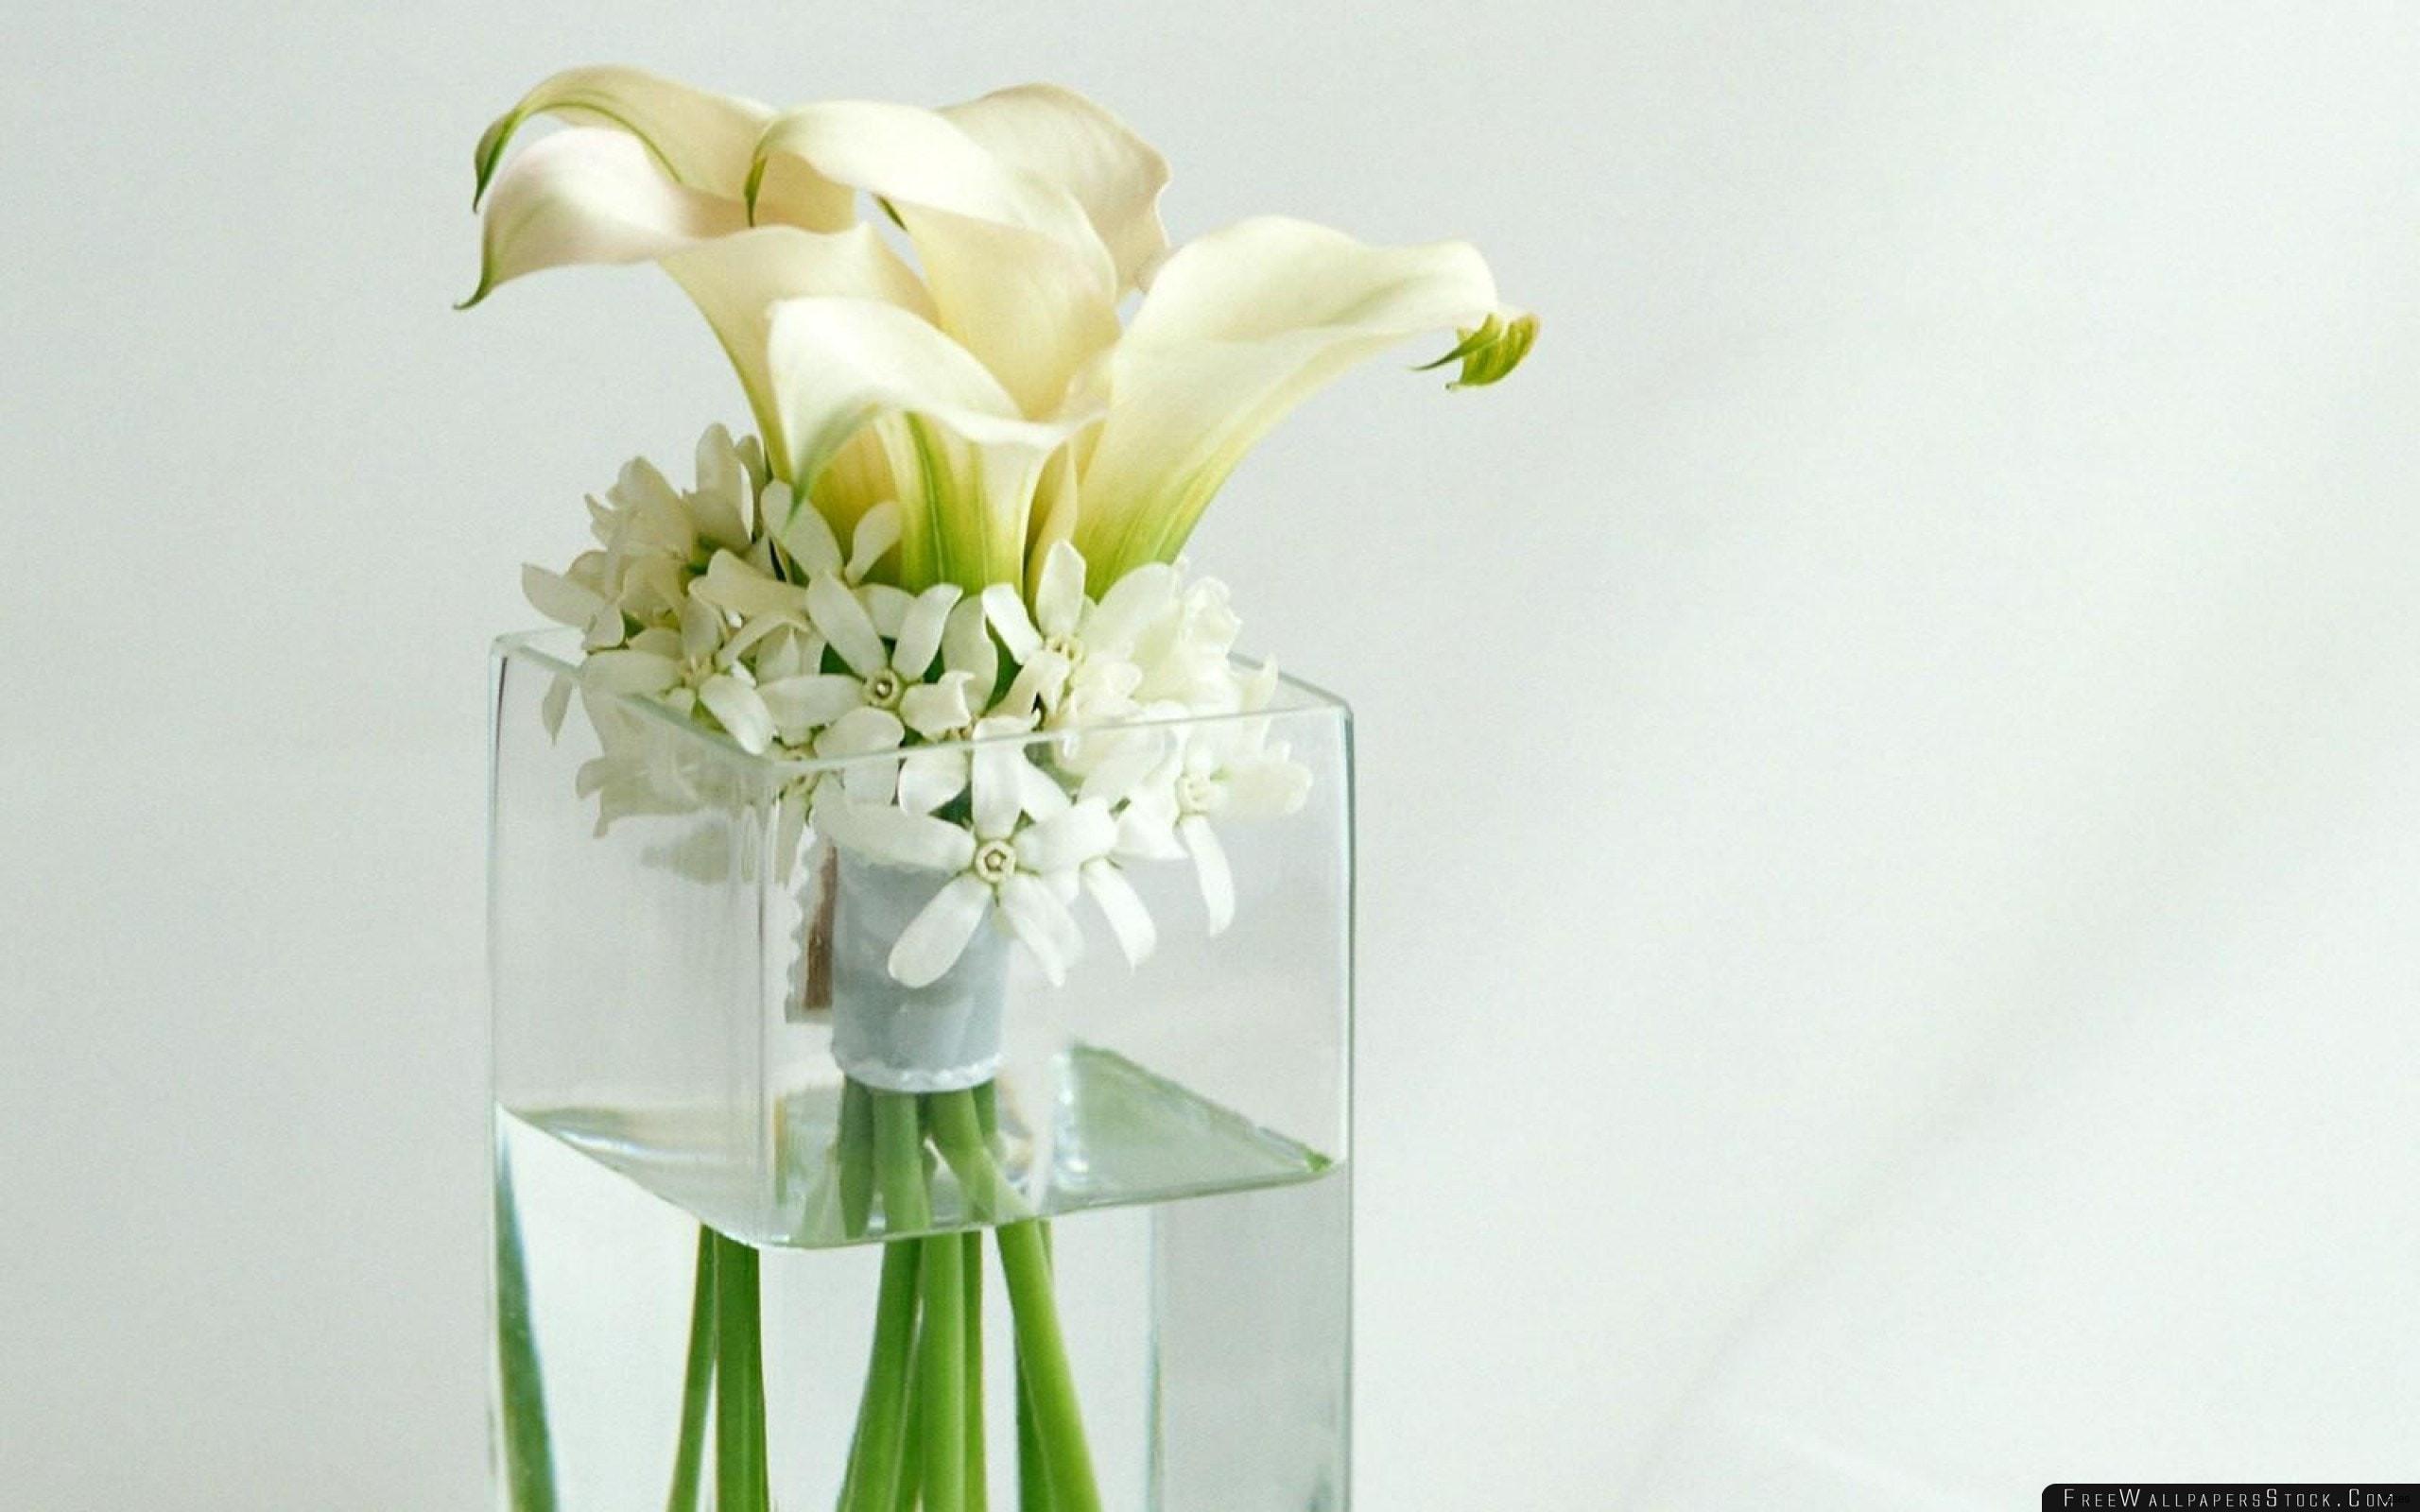 mason jar vase ideas of custom flower vase images 39 00 personalized mason jar vase for custom flower vase photos tall vase centerpiece ideas vases flowers in water 0d artificial of custom